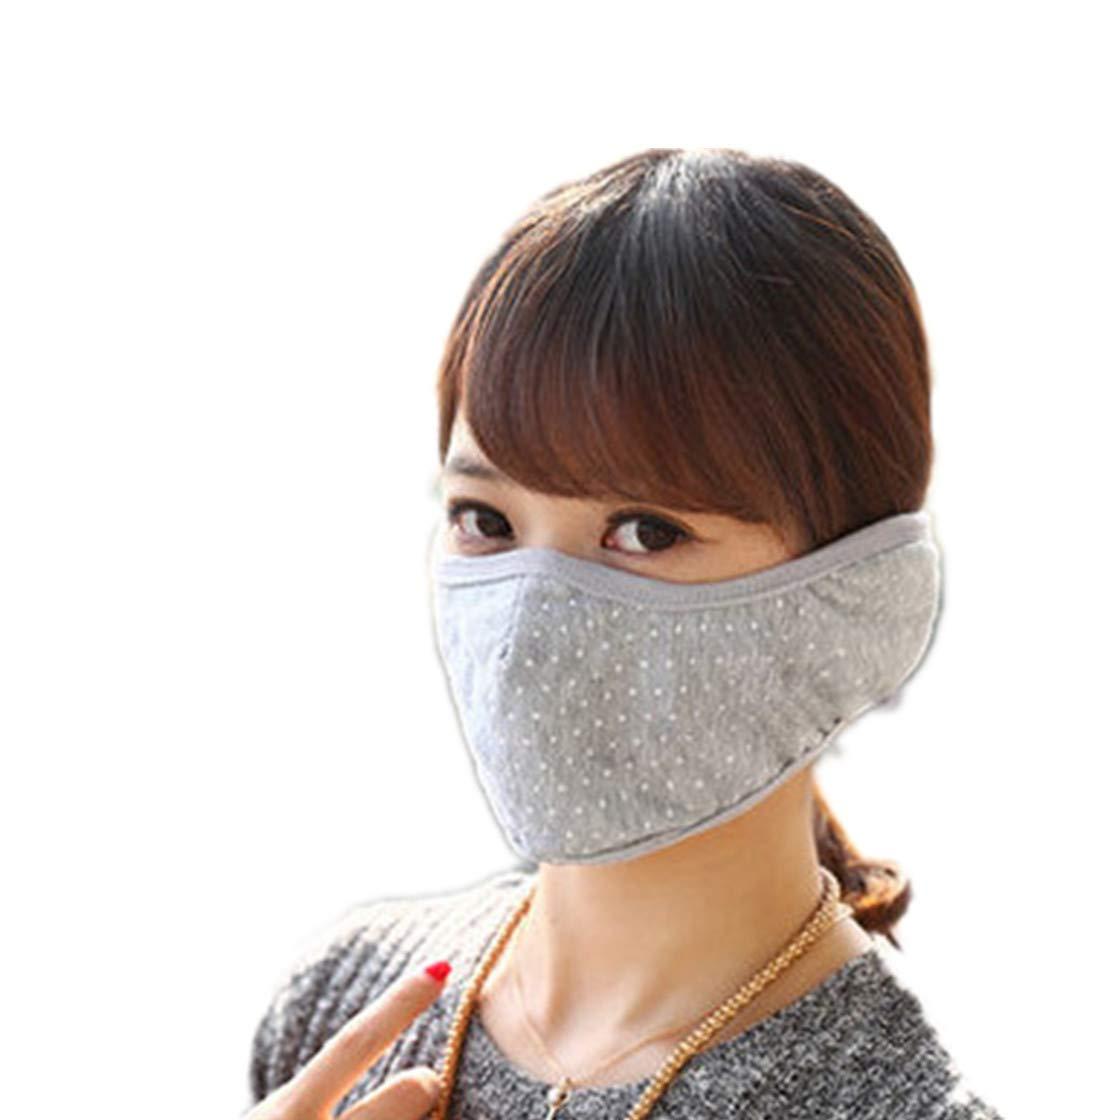 Winter Polka Dot Cotton Ear Loop Face Mouth MaskWarmer Ear Muffs for Outdoors